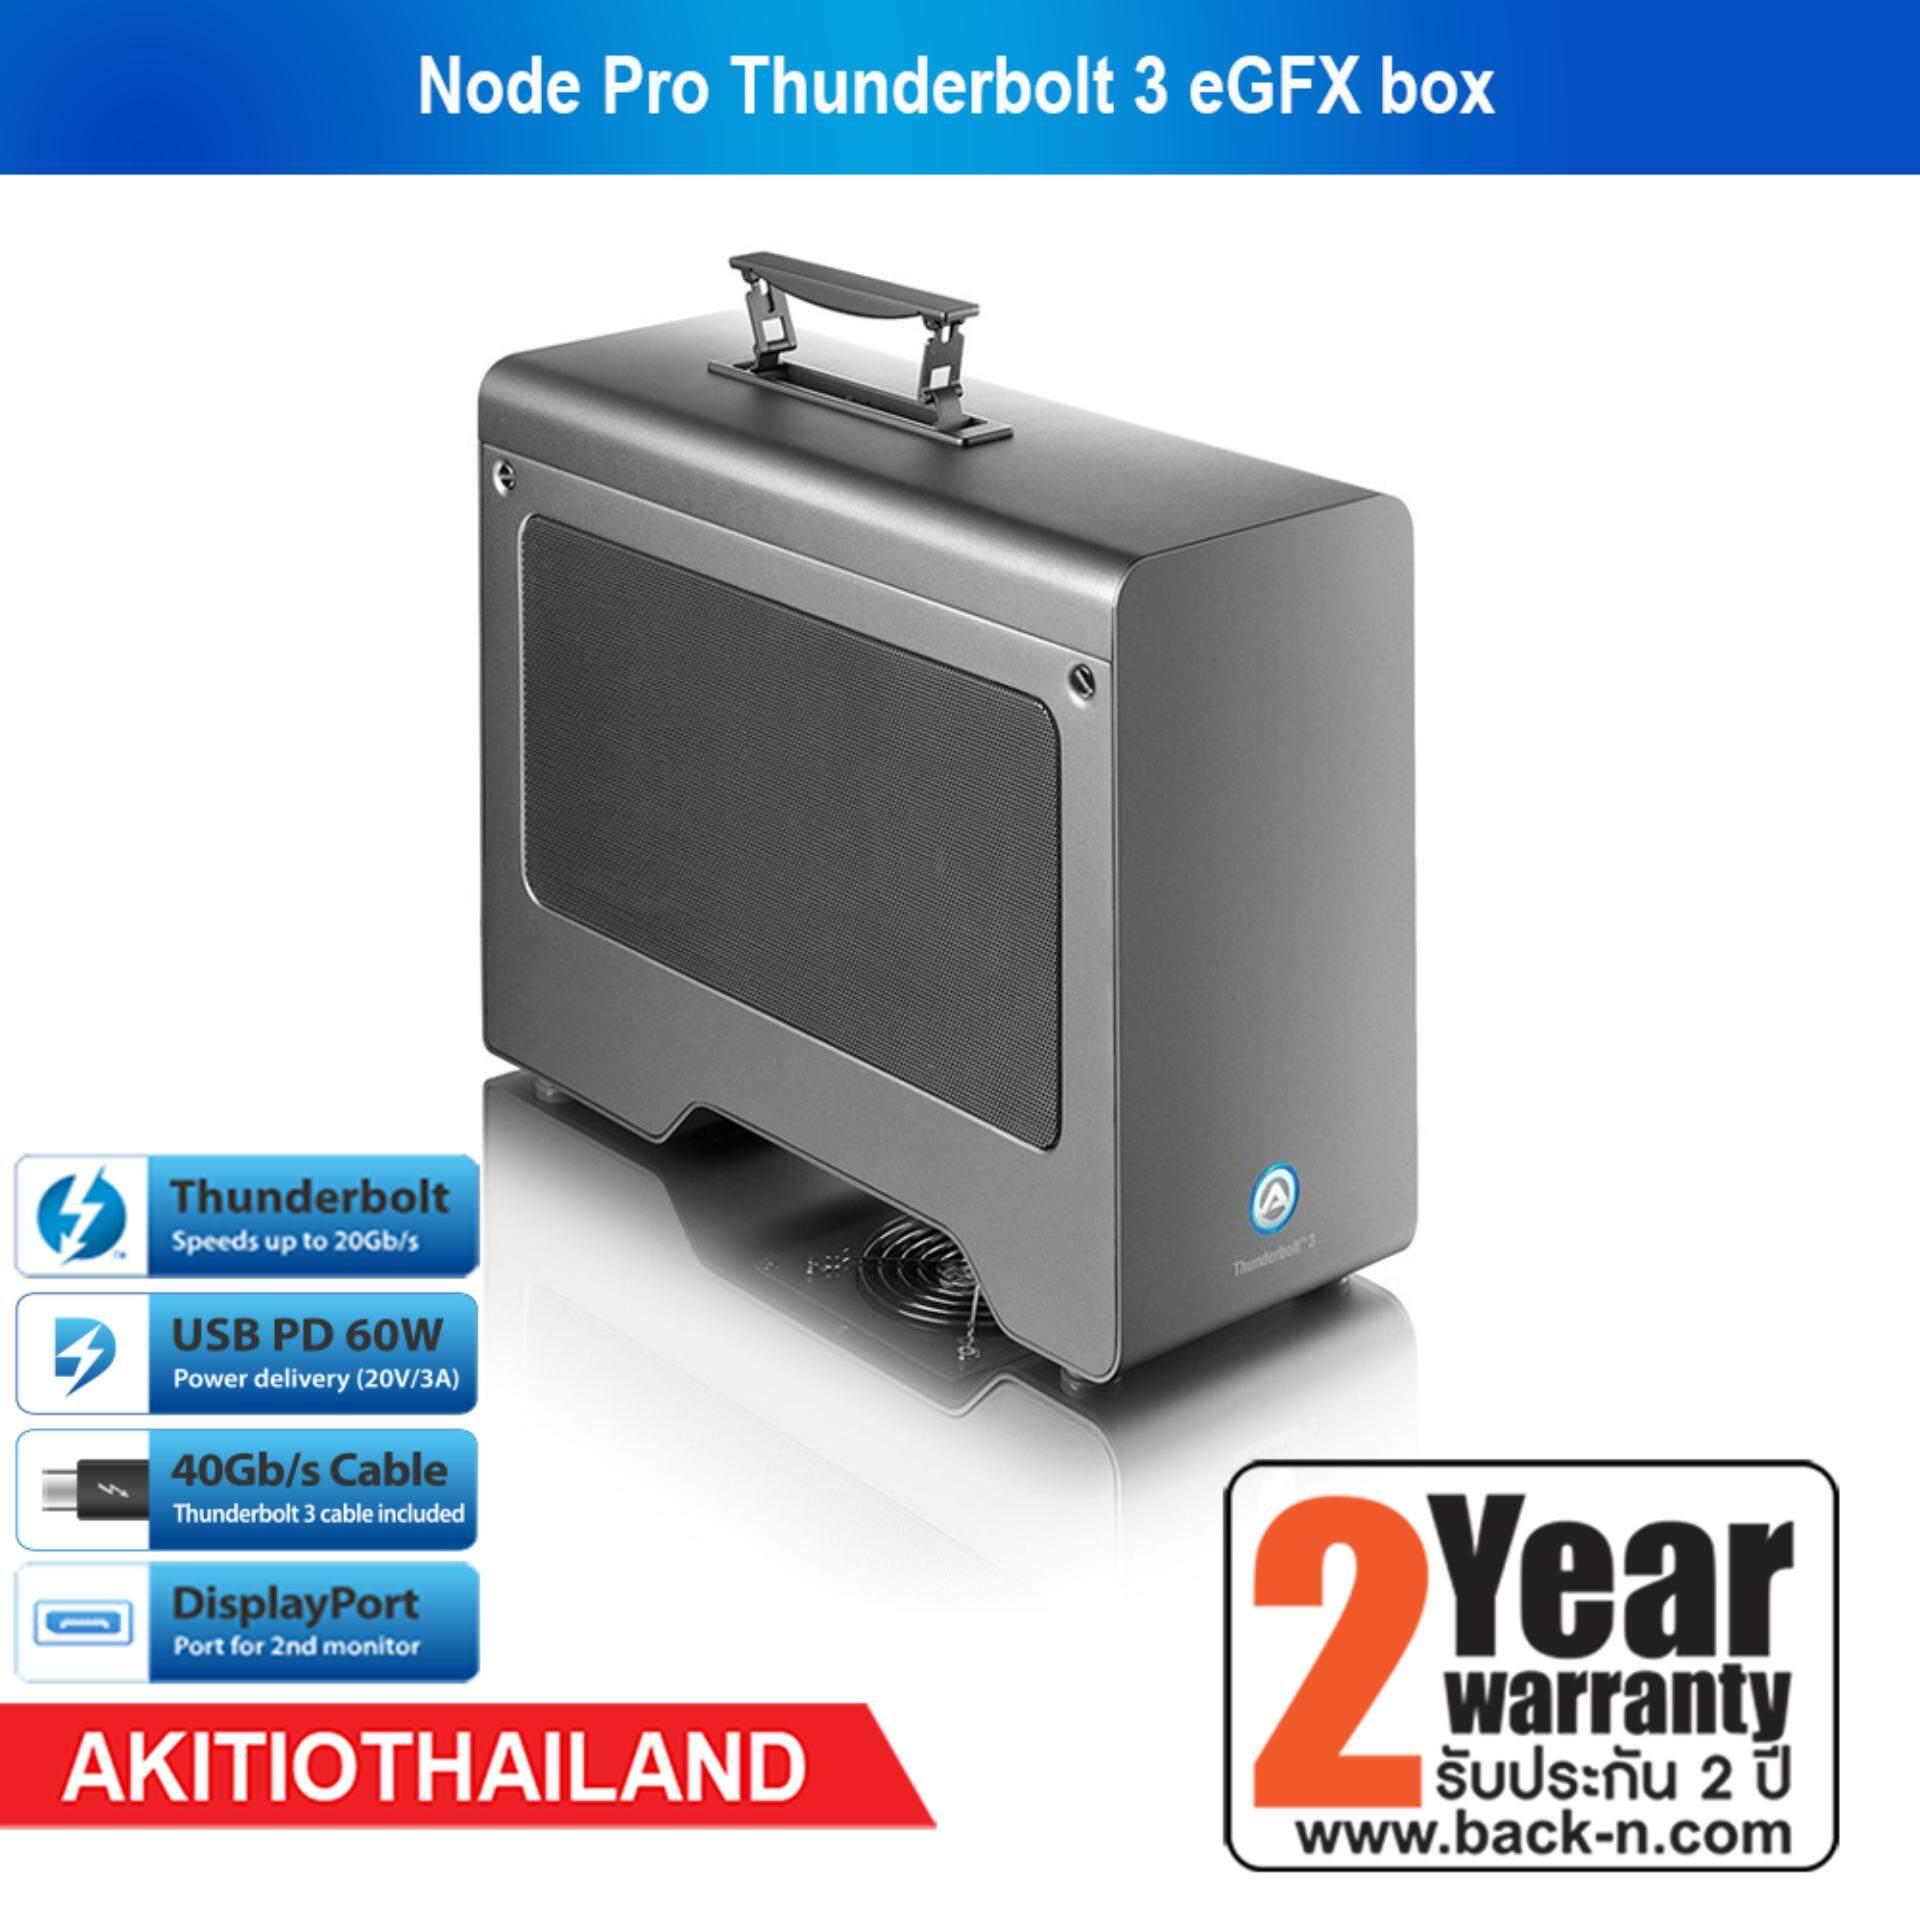 AKITIO Node Pro Thunderbolt 3 eGFX box กล่องใส่การ์ดจอ เชื่อมต่อผ่านธันเดอร์โบลท์ 3 สีเทา รีวิว mac mini 2018 mac mini 2018 mac mini 2018 อัพเกรด egpu egpu mac mini mac mini เพิ่มแรม hackintosh - รีวิว Mac mini 2018 แบบสั่ง CTO เน้นอัพเกรดเอง ประหยัดไป 34,000 บาท ฉบับปี 2019